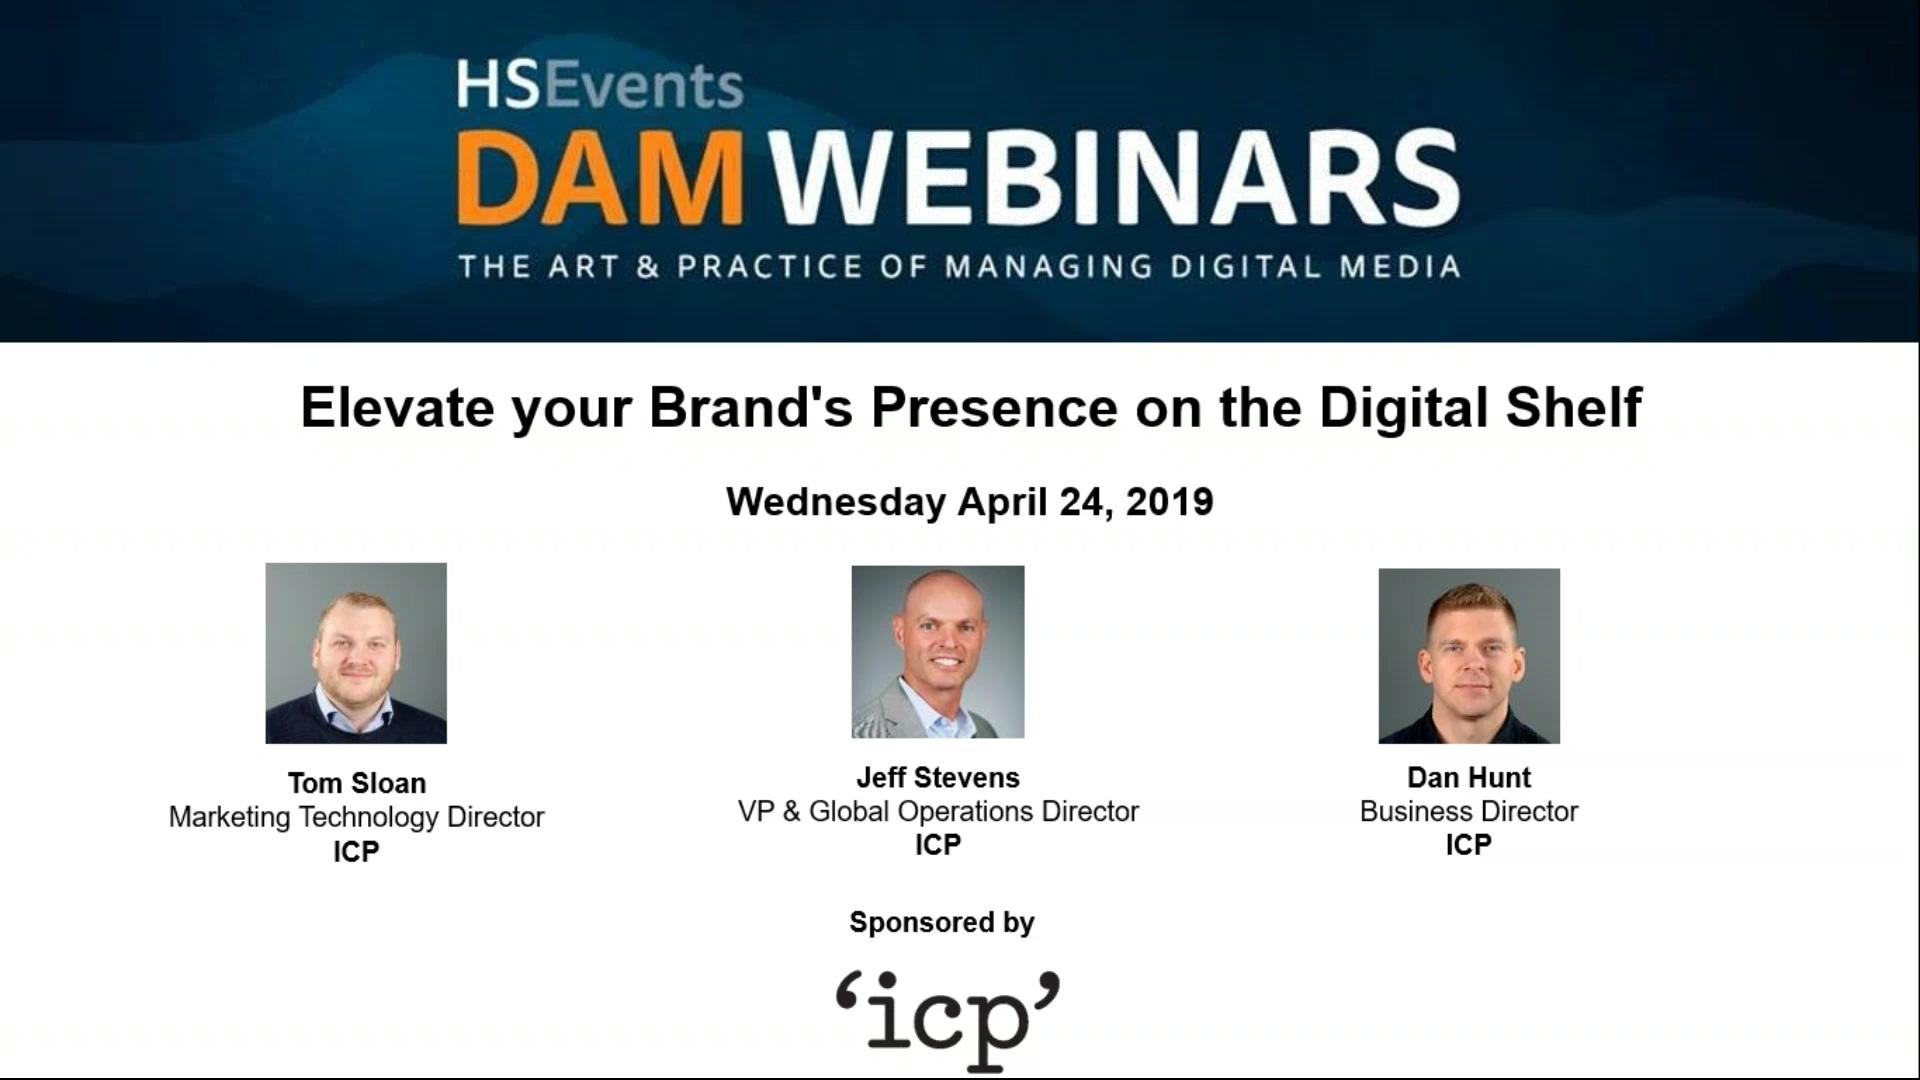 5) 24 April 2019 -  Elevate your Brand_s Presence on the Digital Shelf